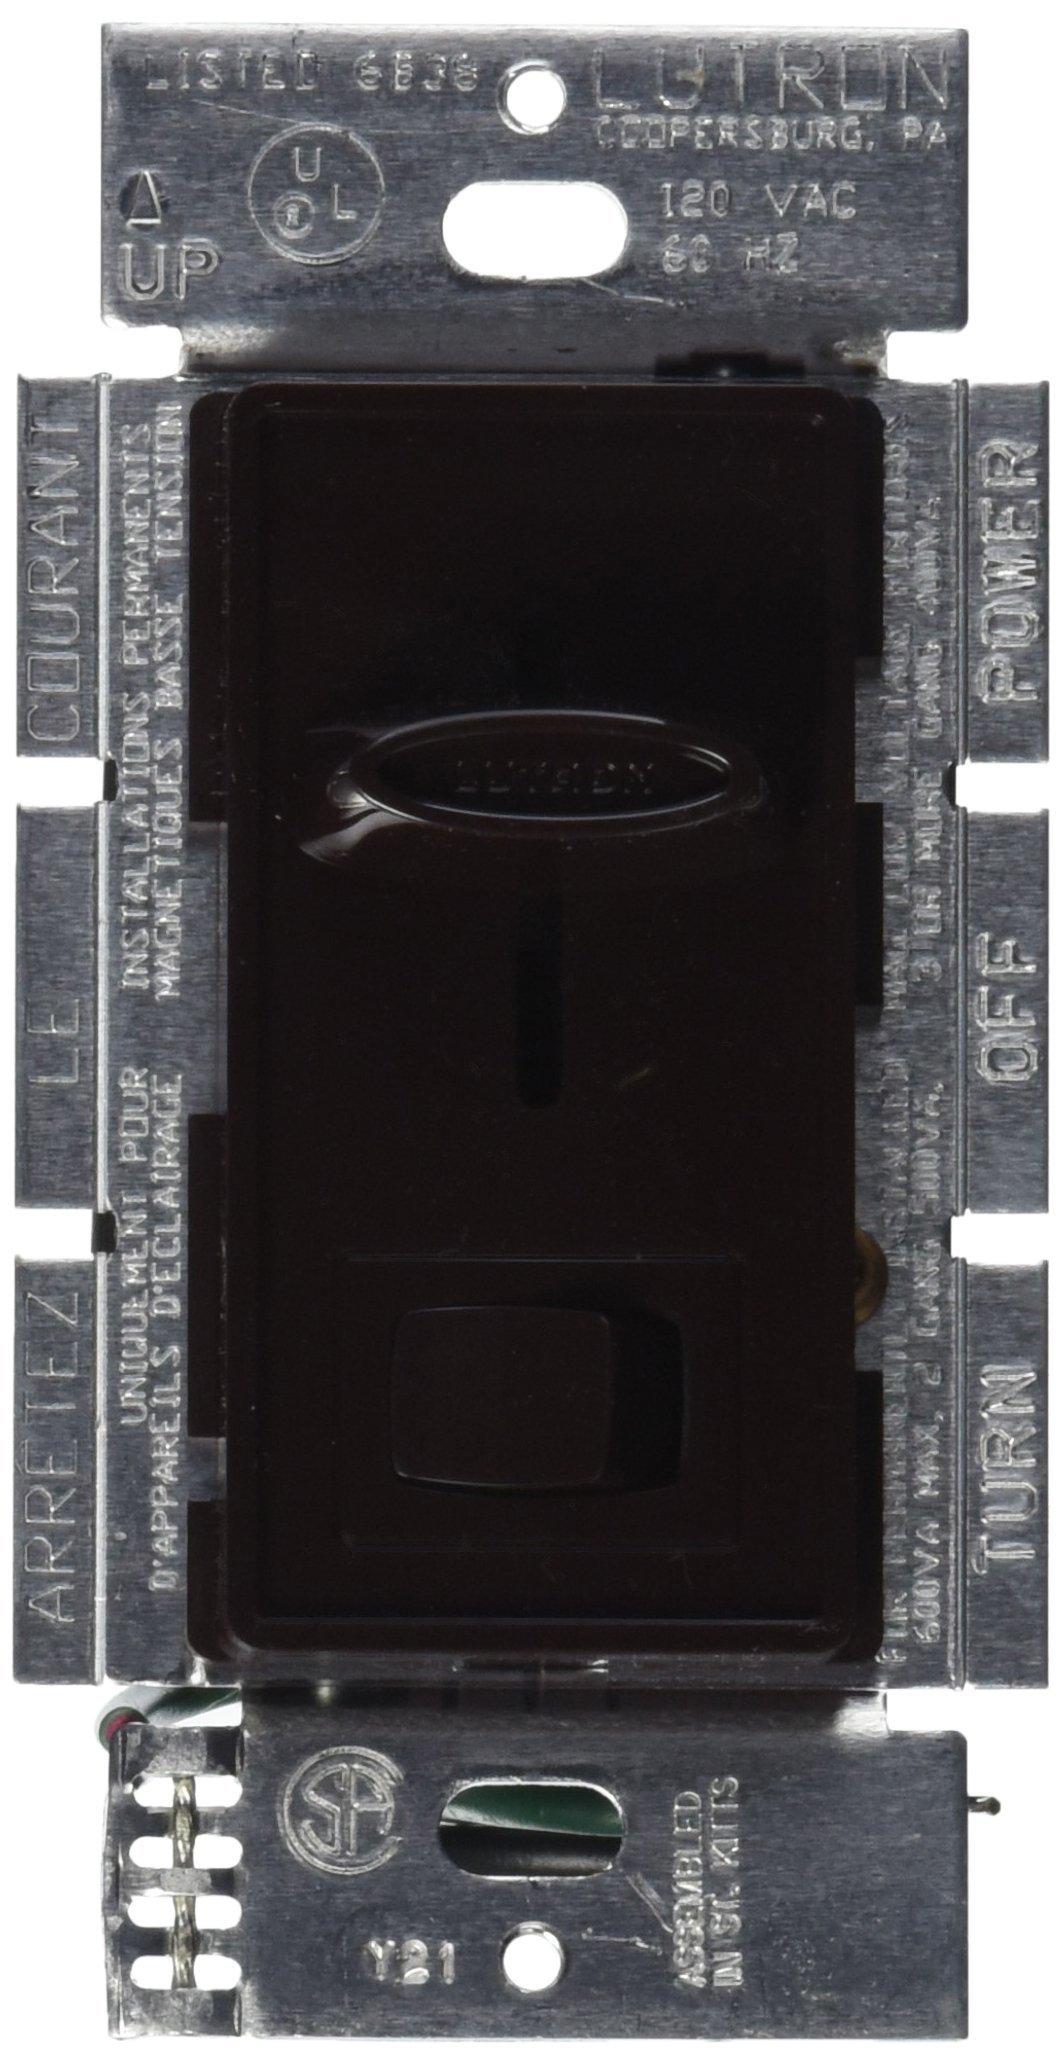 Lutron Lutron SLV-600P-BR Skylark 450-Watt Single Pole Electronic Low-Voltage Dimmer, Brown by Lutron